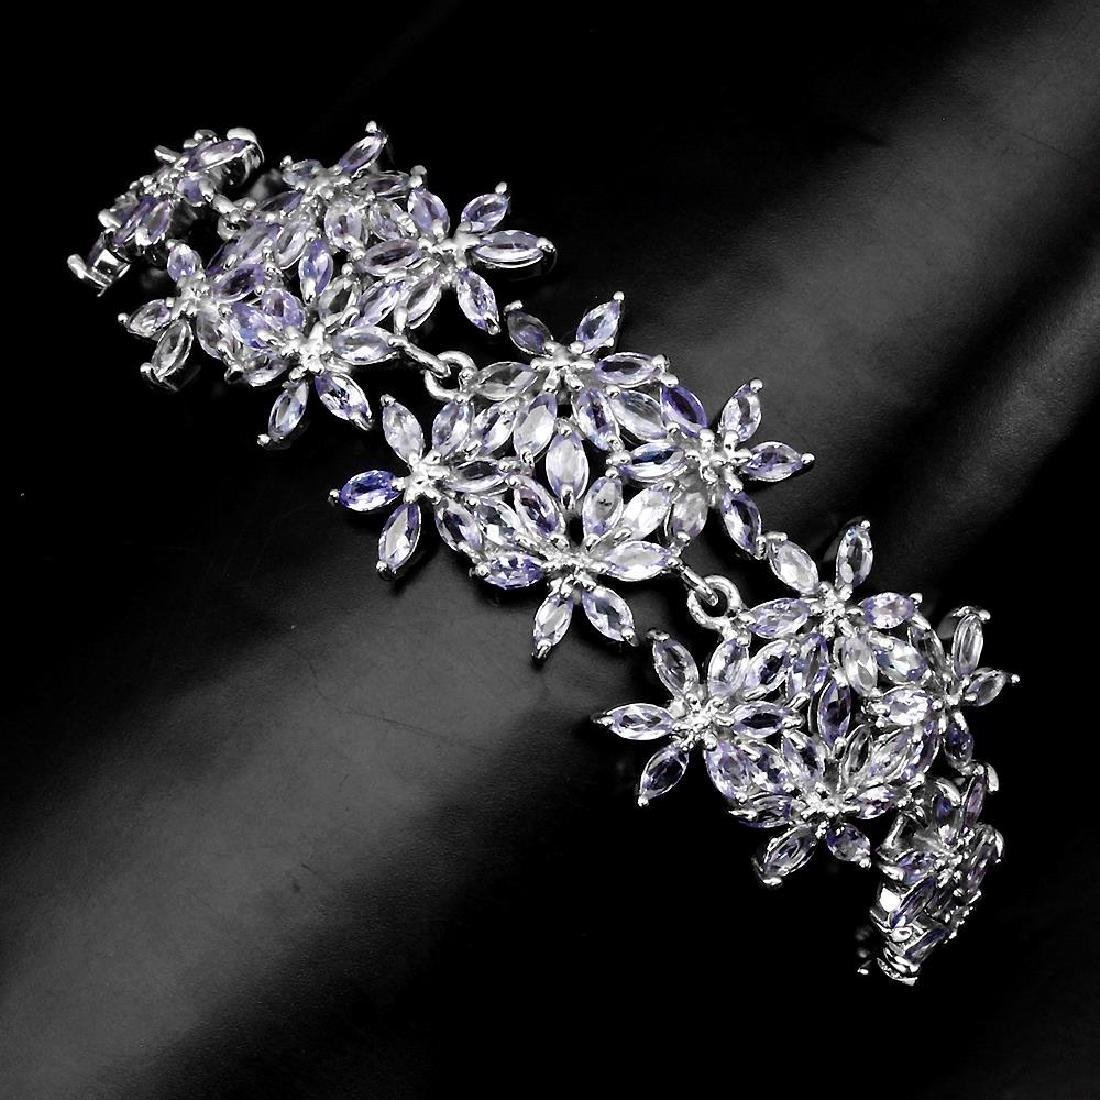 Platinum Sterling Silver Tanzanite Bracelet, 11.88ctw